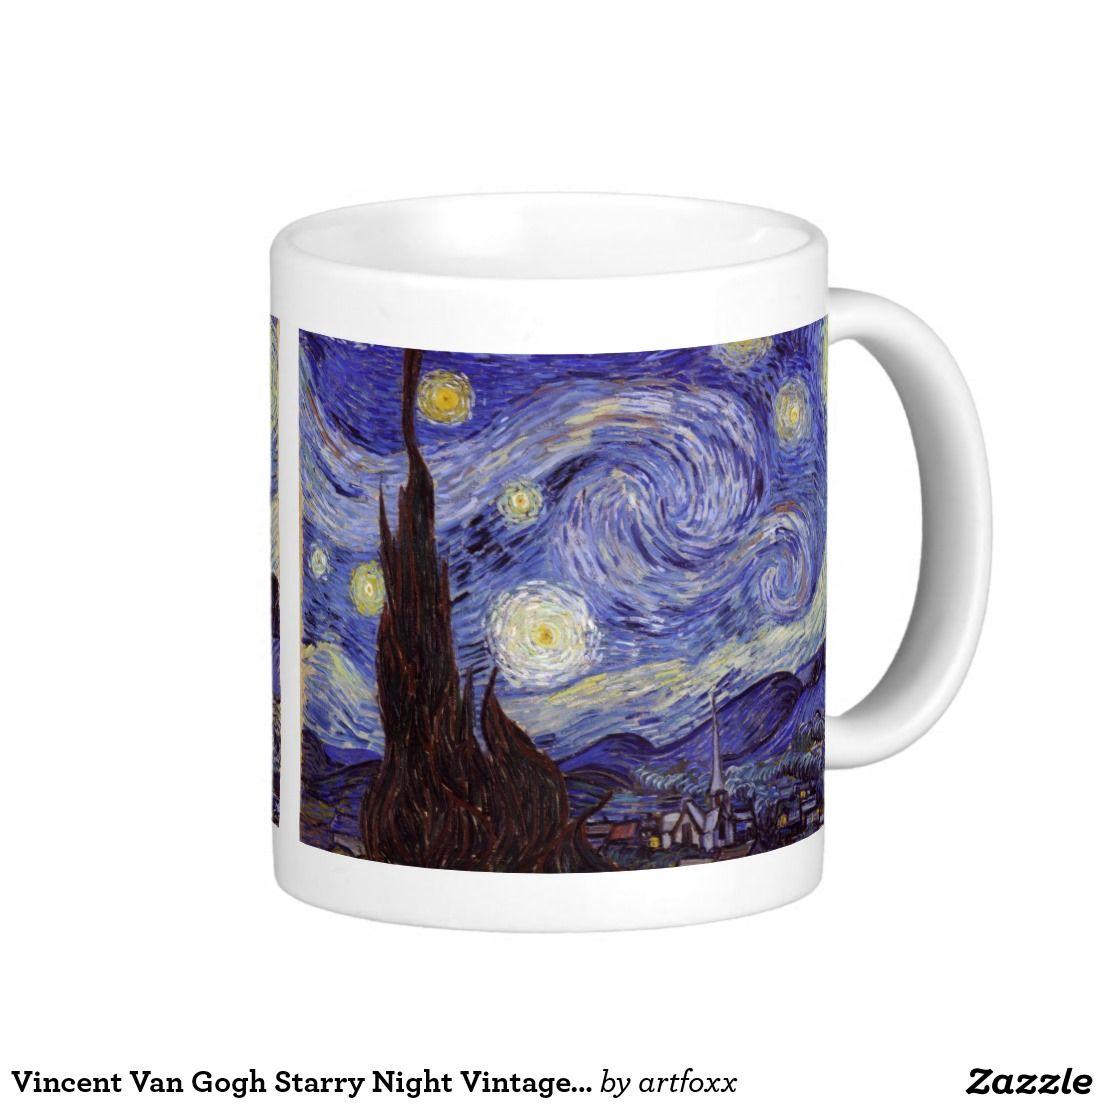 Vincent Van Gogh Starry Night Vintage Fine Art Coffee Mug Zazzle Com Starry Night Van Gogh Van Gogh Vincent Van Gogh